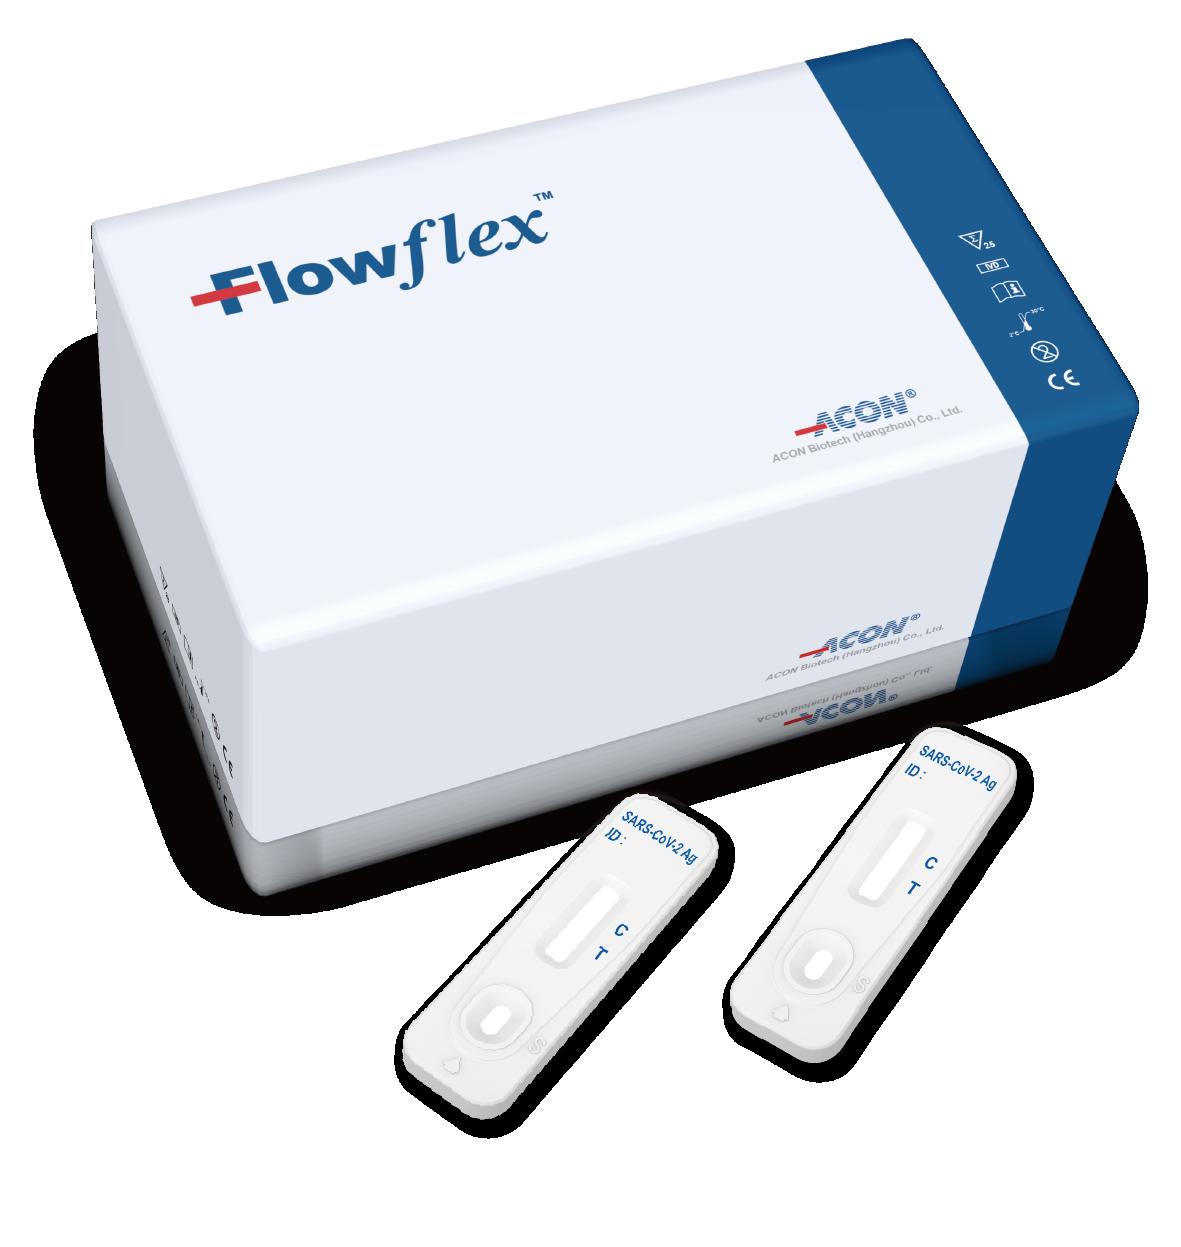 ACON Flowflex SARS-CoV-2 Antigen Rapid Test (Self-Testing)